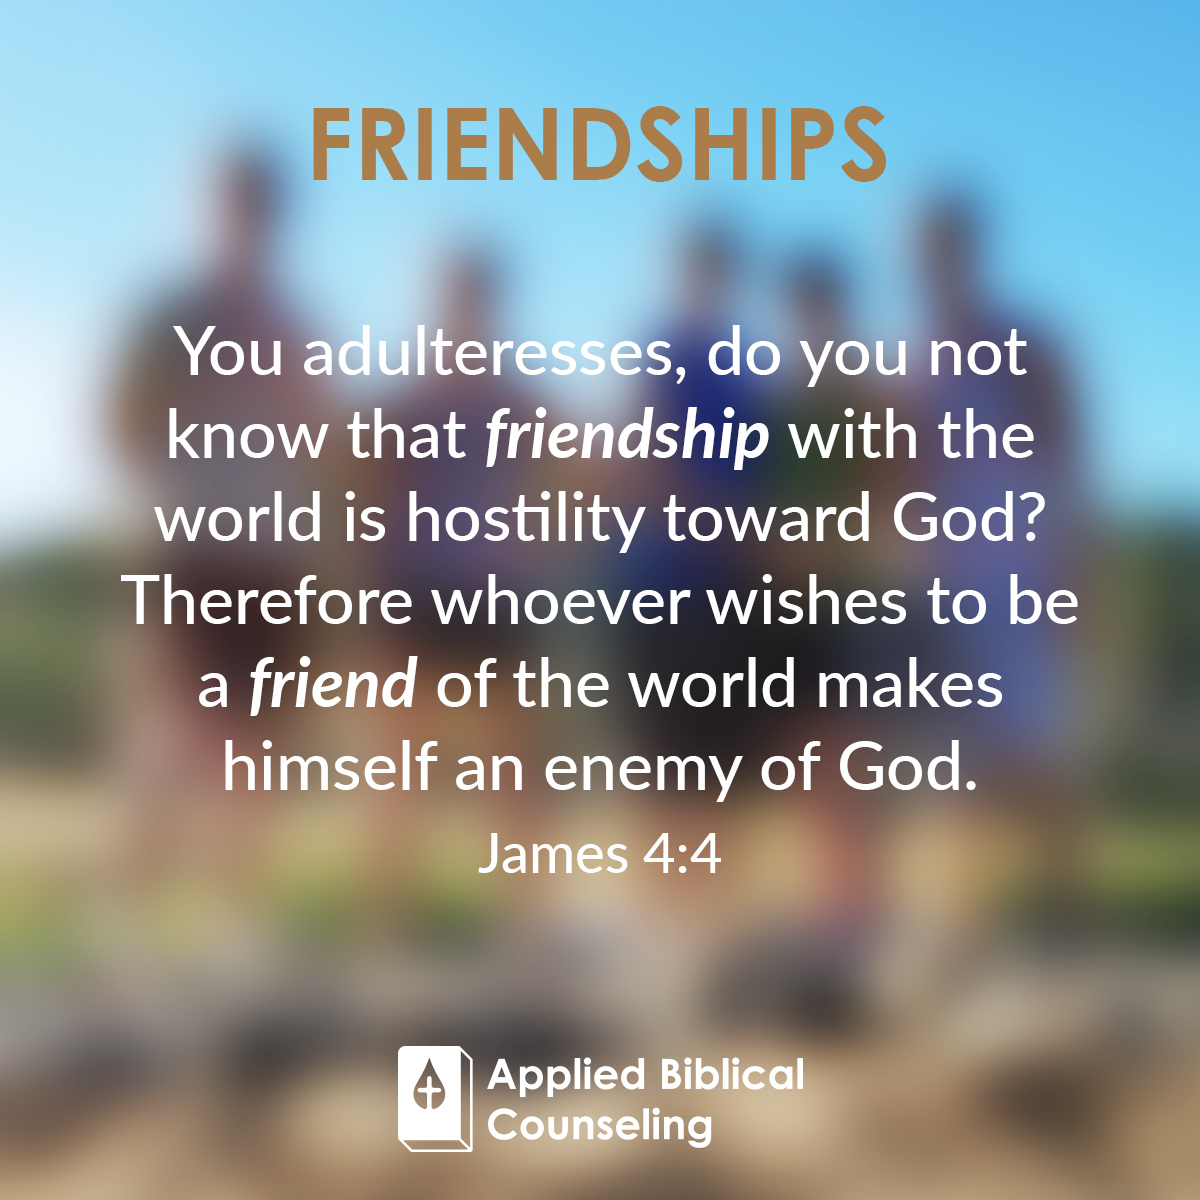 ABC Facebook w13 friendships 3